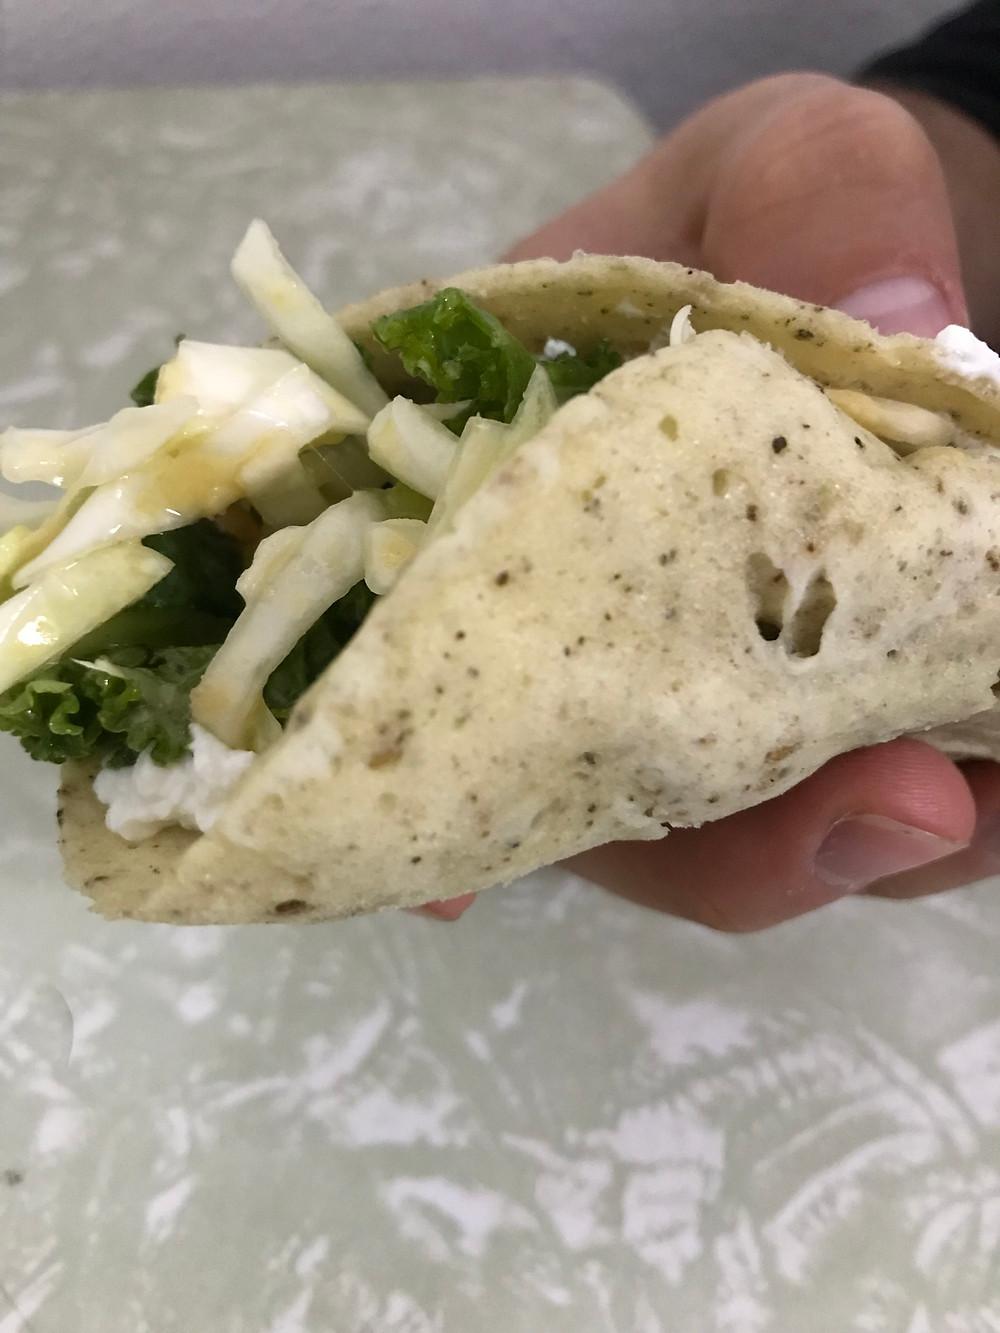 tahini healthy bread replacement תחינה לפה לחם בריא